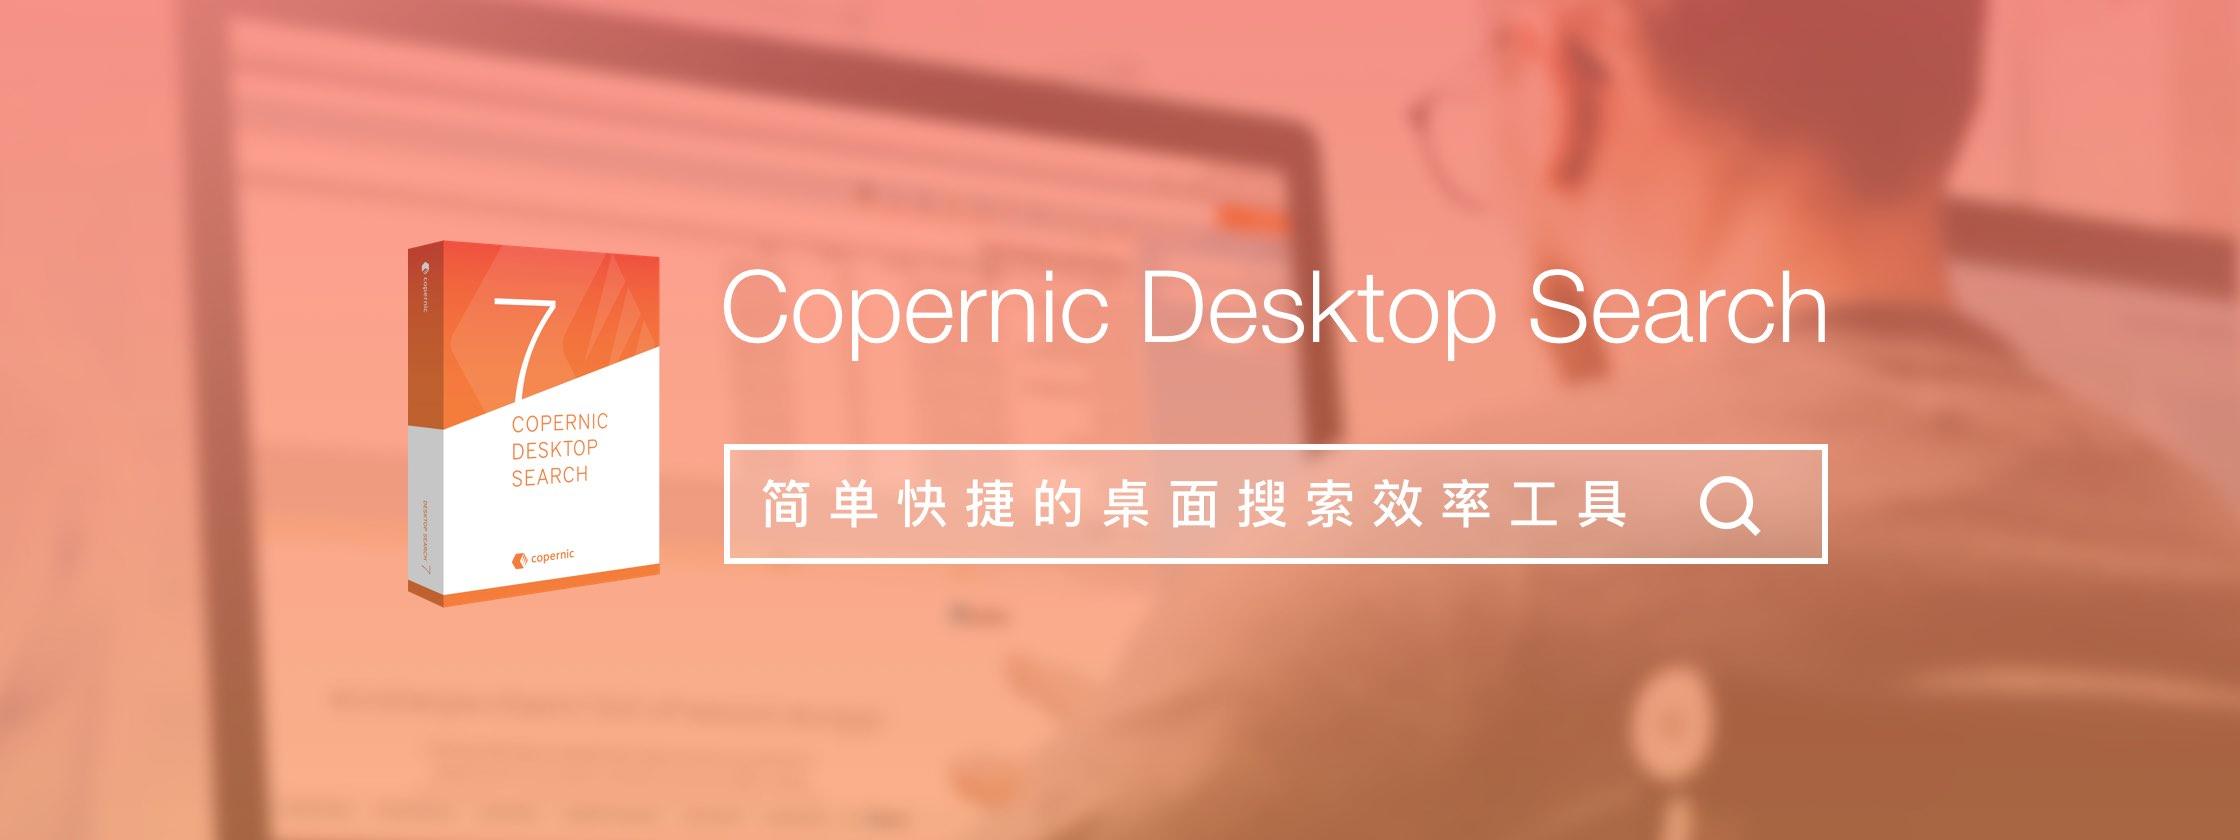 Copernic Desktop Search,简单快捷的桌面搜索工具